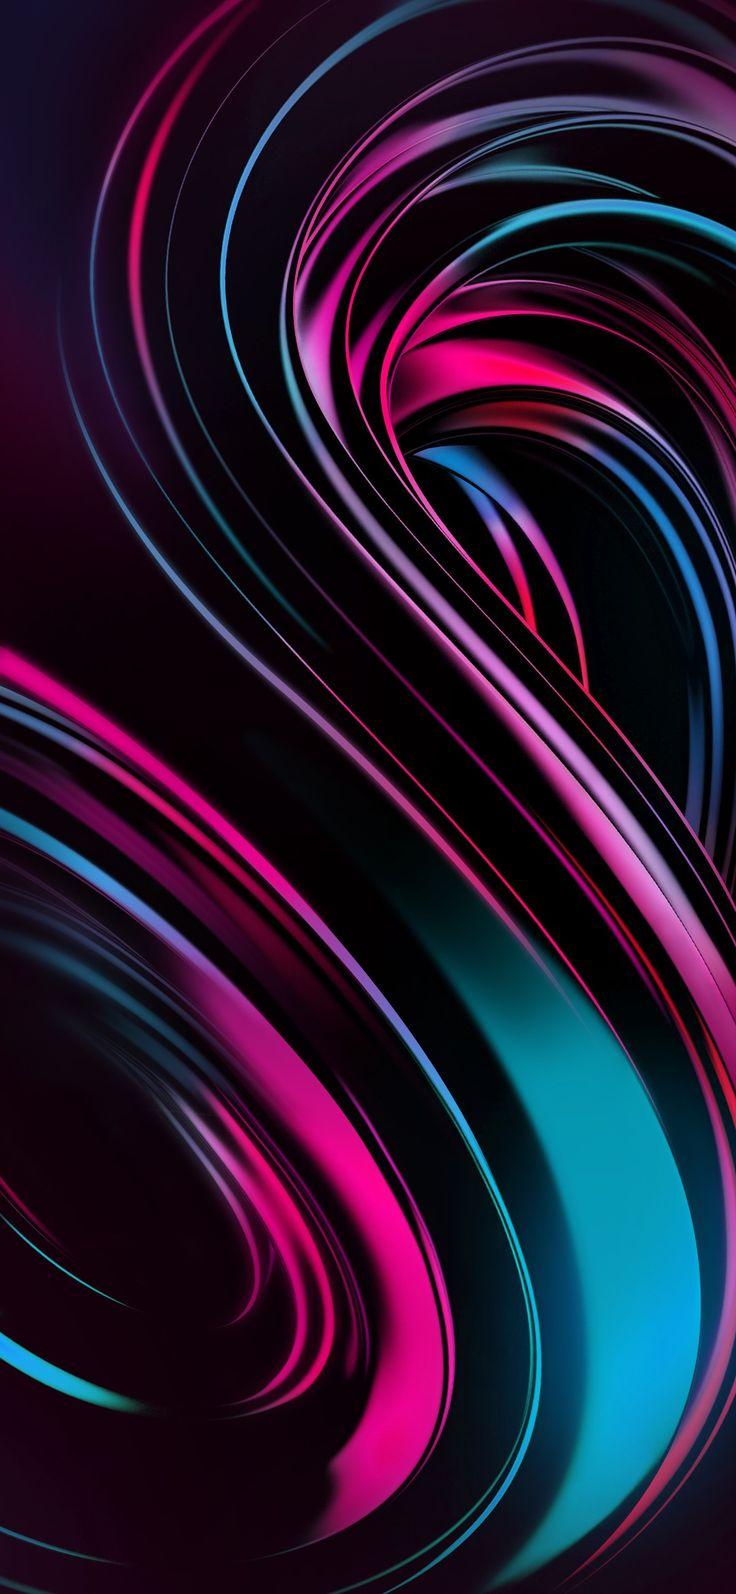 Vivo Next Dual Display Abstract iphone wallpaper, 3d